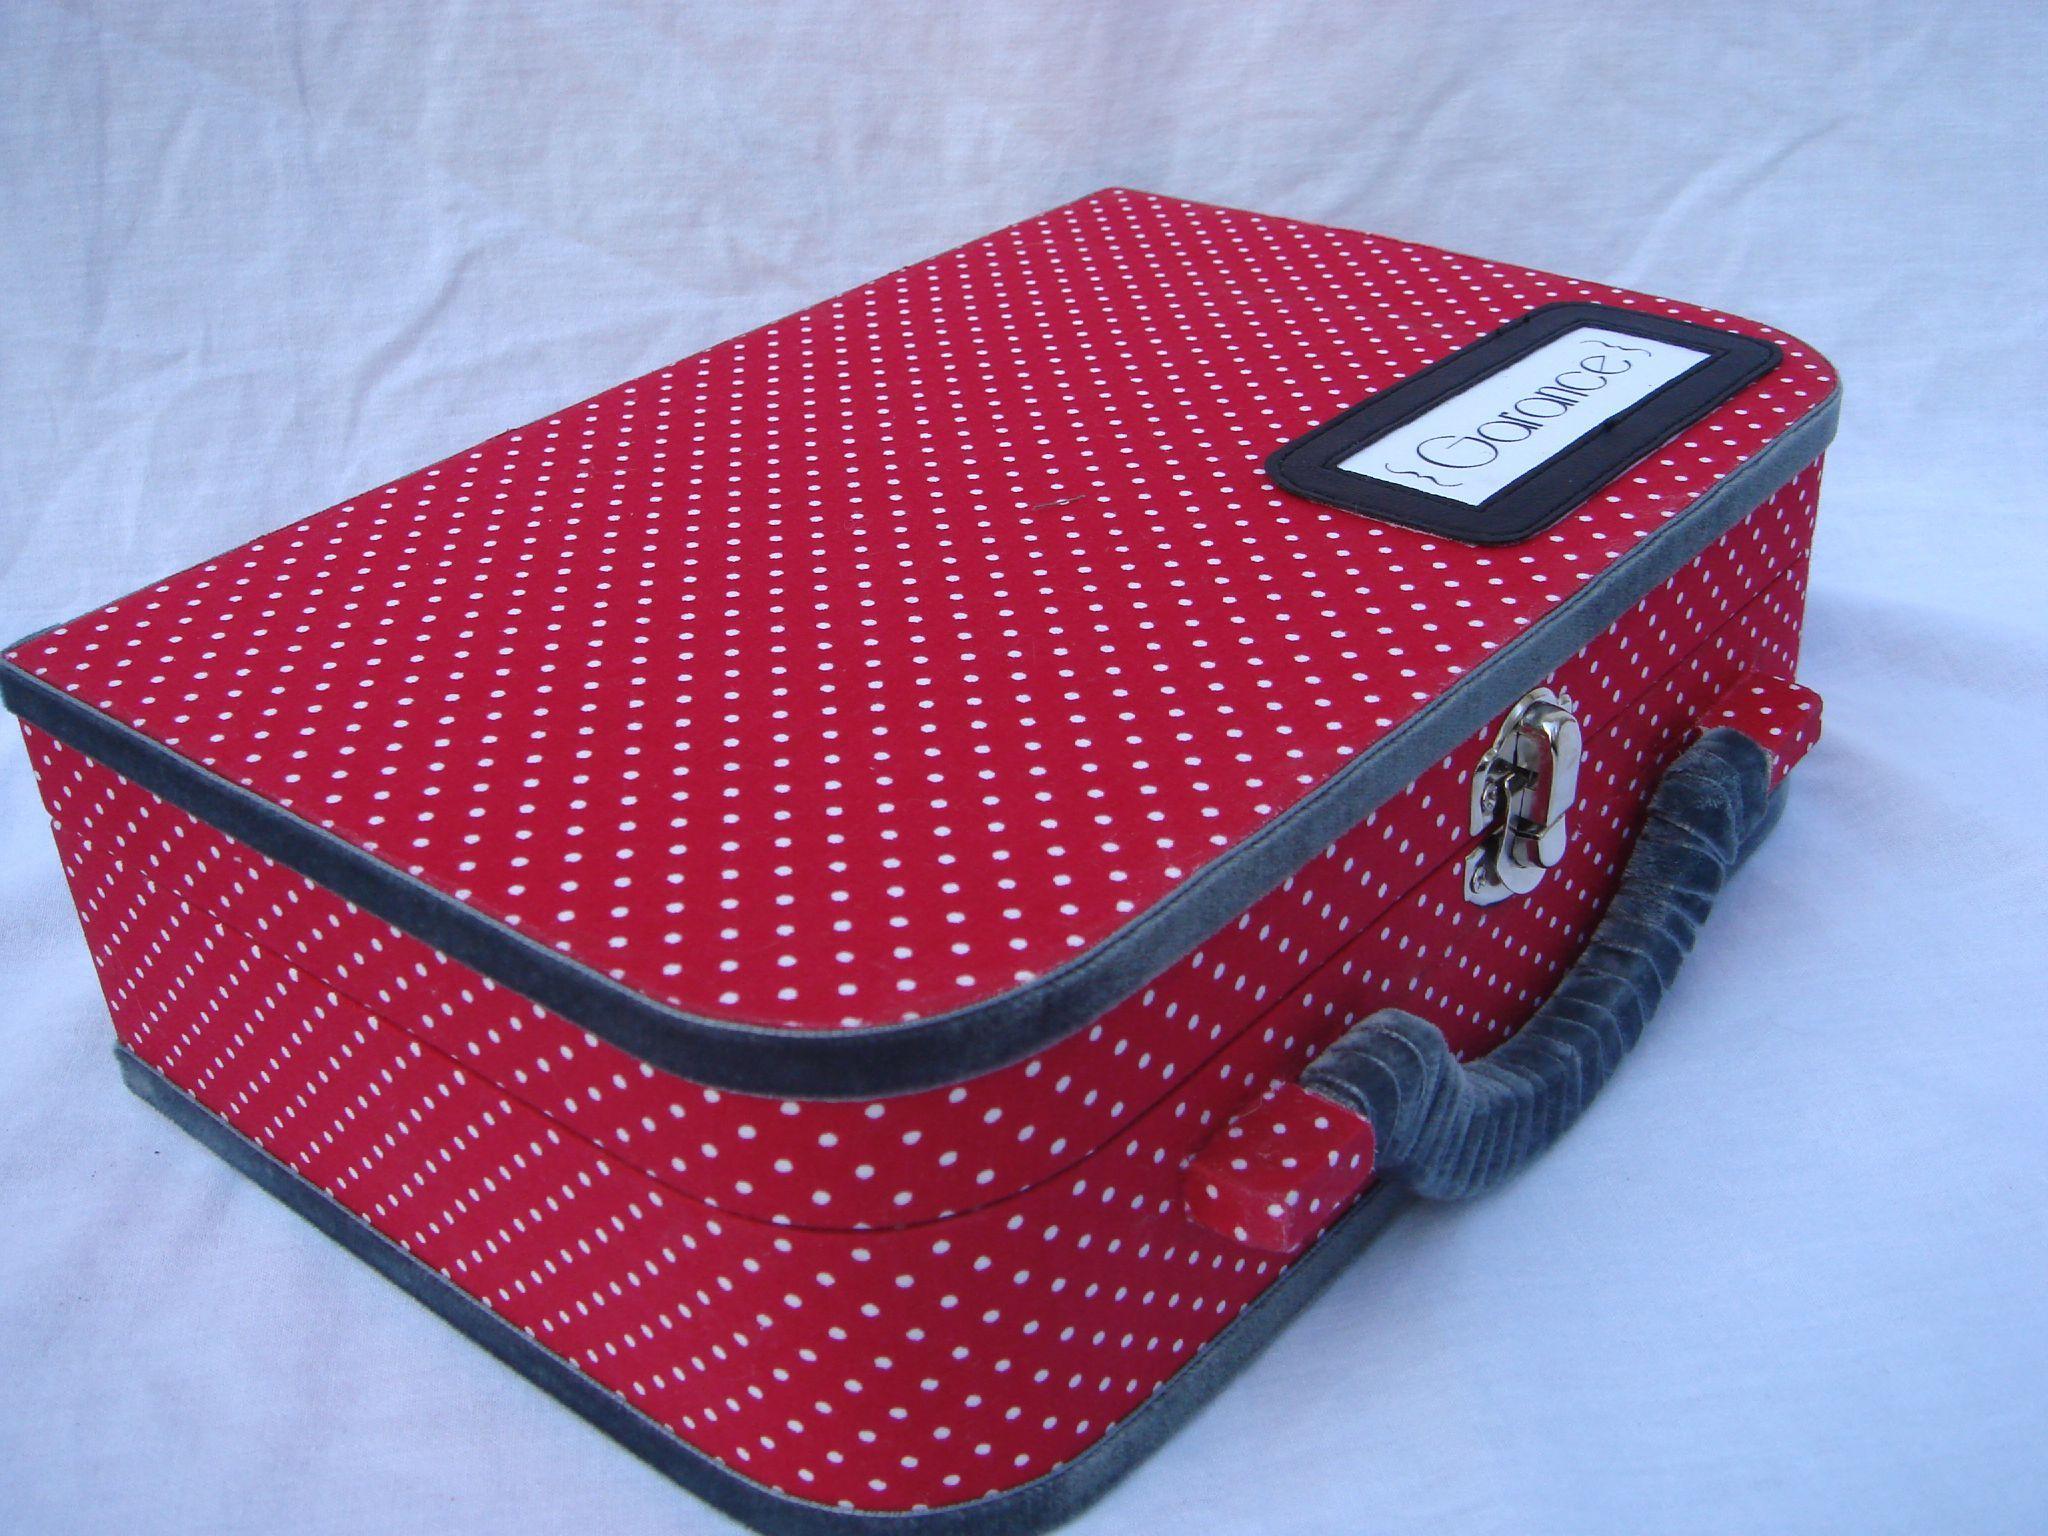 recouvrir une valise de tissu diy pinterest valises tissu et valise en carton. Black Bedroom Furniture Sets. Home Design Ideas